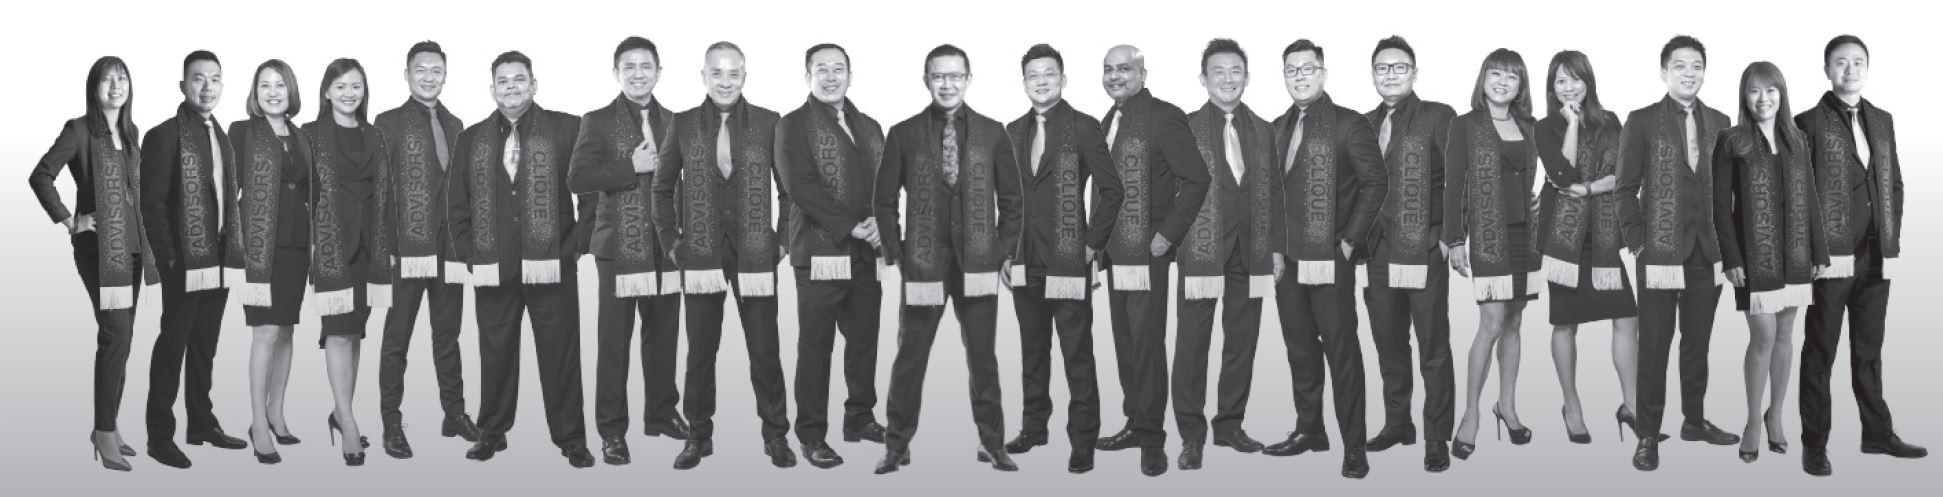 AC directors 2018.JPG